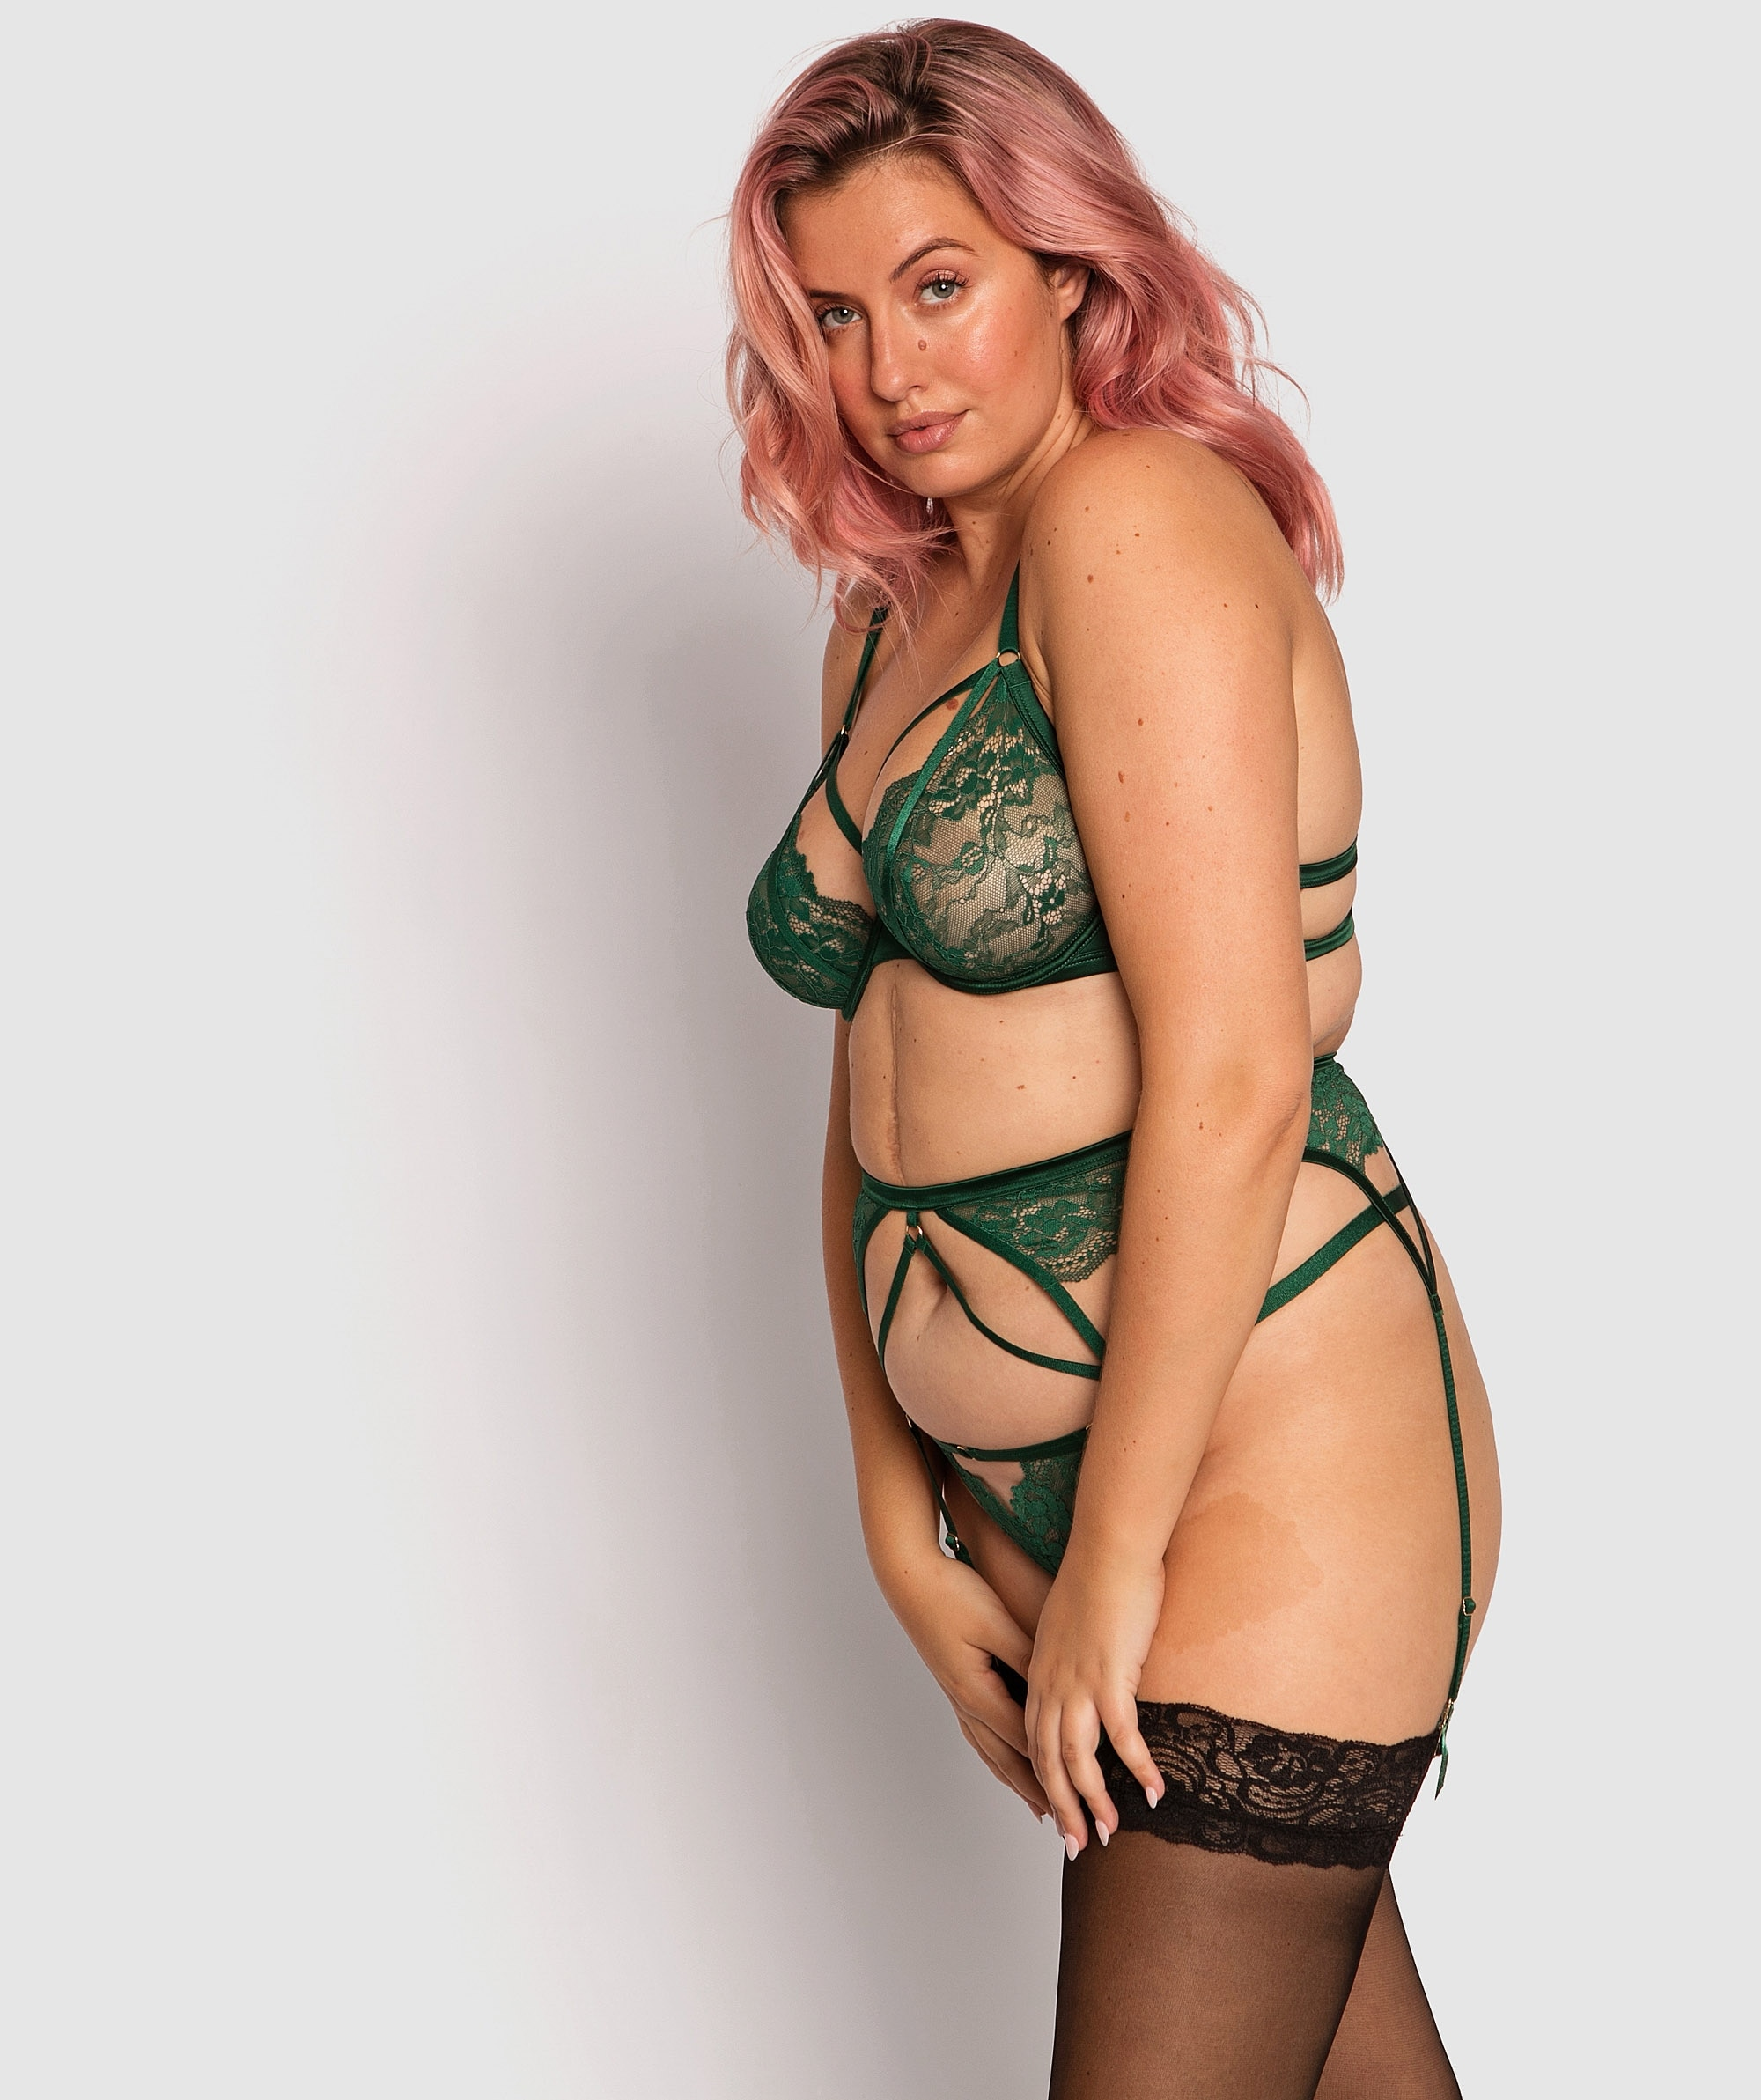 Envy Suspender - Dark Green